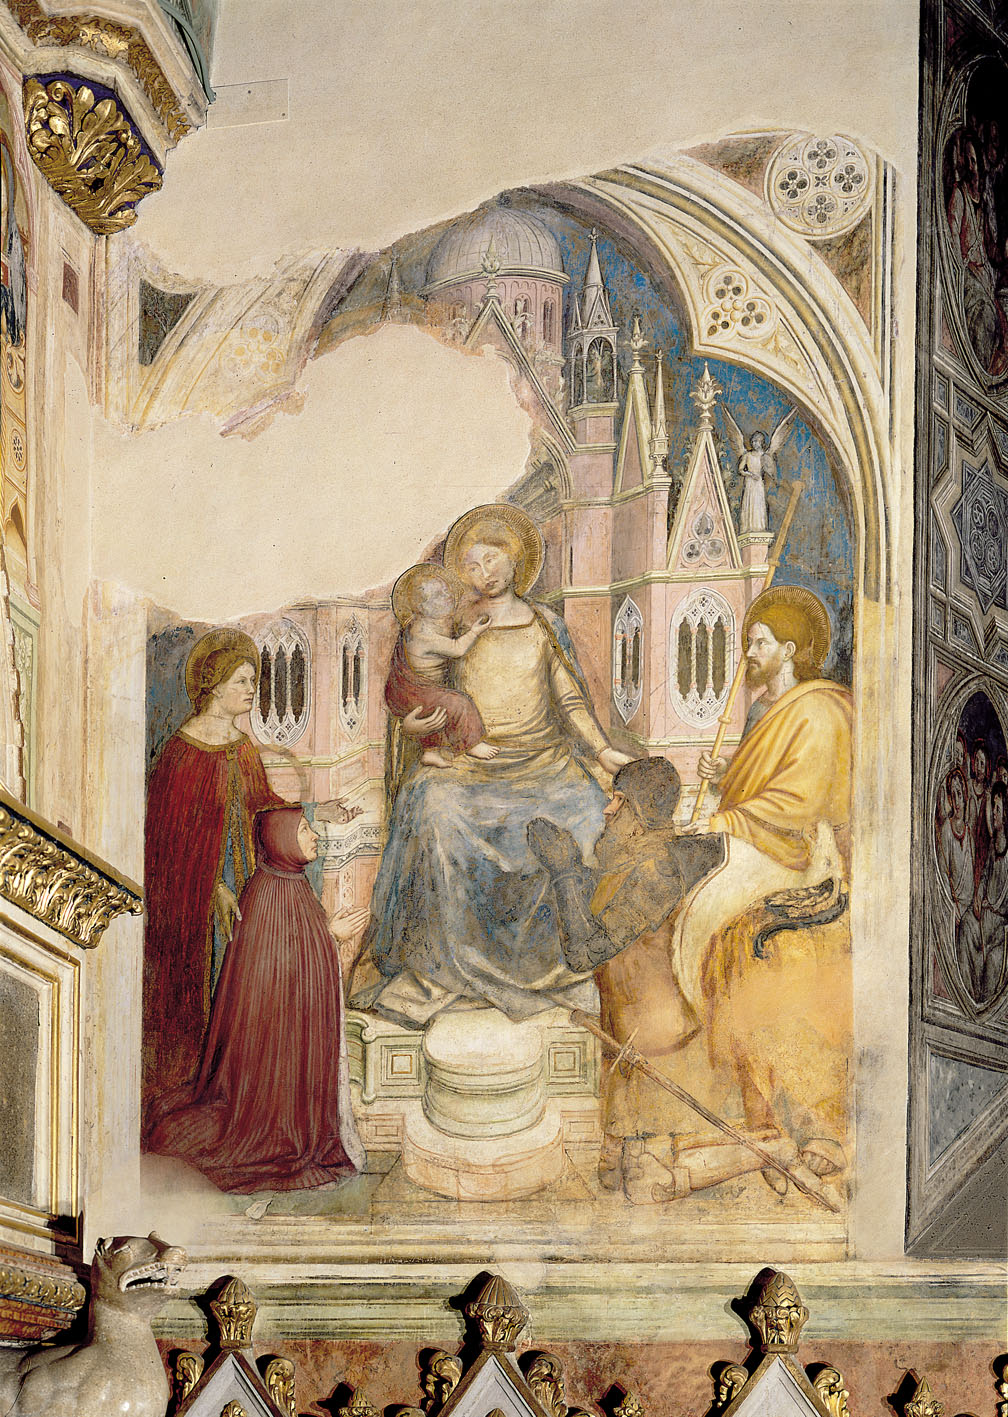 1377-79 Altichiero Ste Catherine, Catarina Franceschi epouse, Bonifacio de Lupi, Jaques, Capella San Giogio, Sant Antonio, Padova